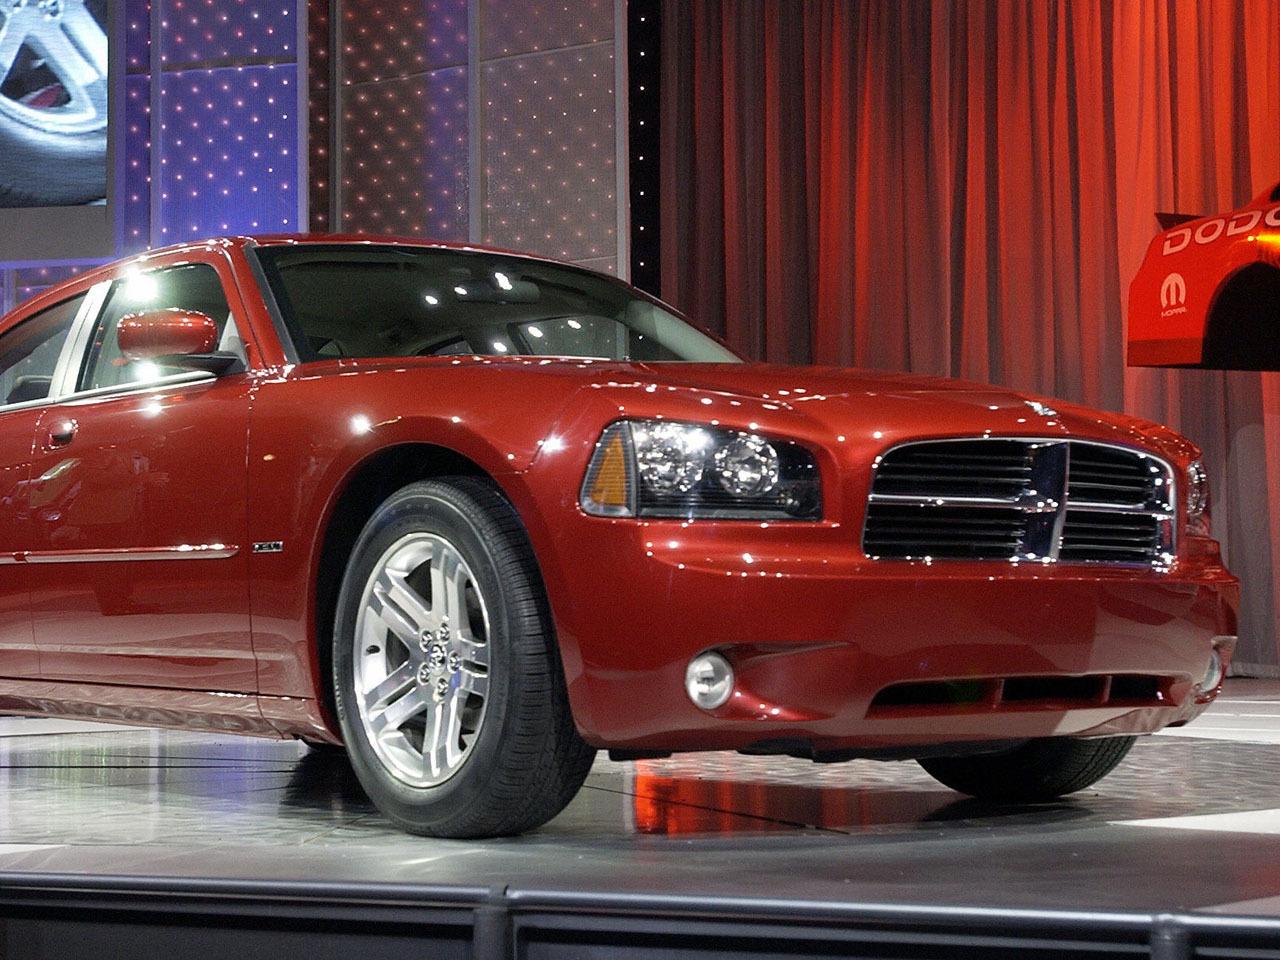 Feds probe Chrysler, Dodge models for engine stalling - CBS News